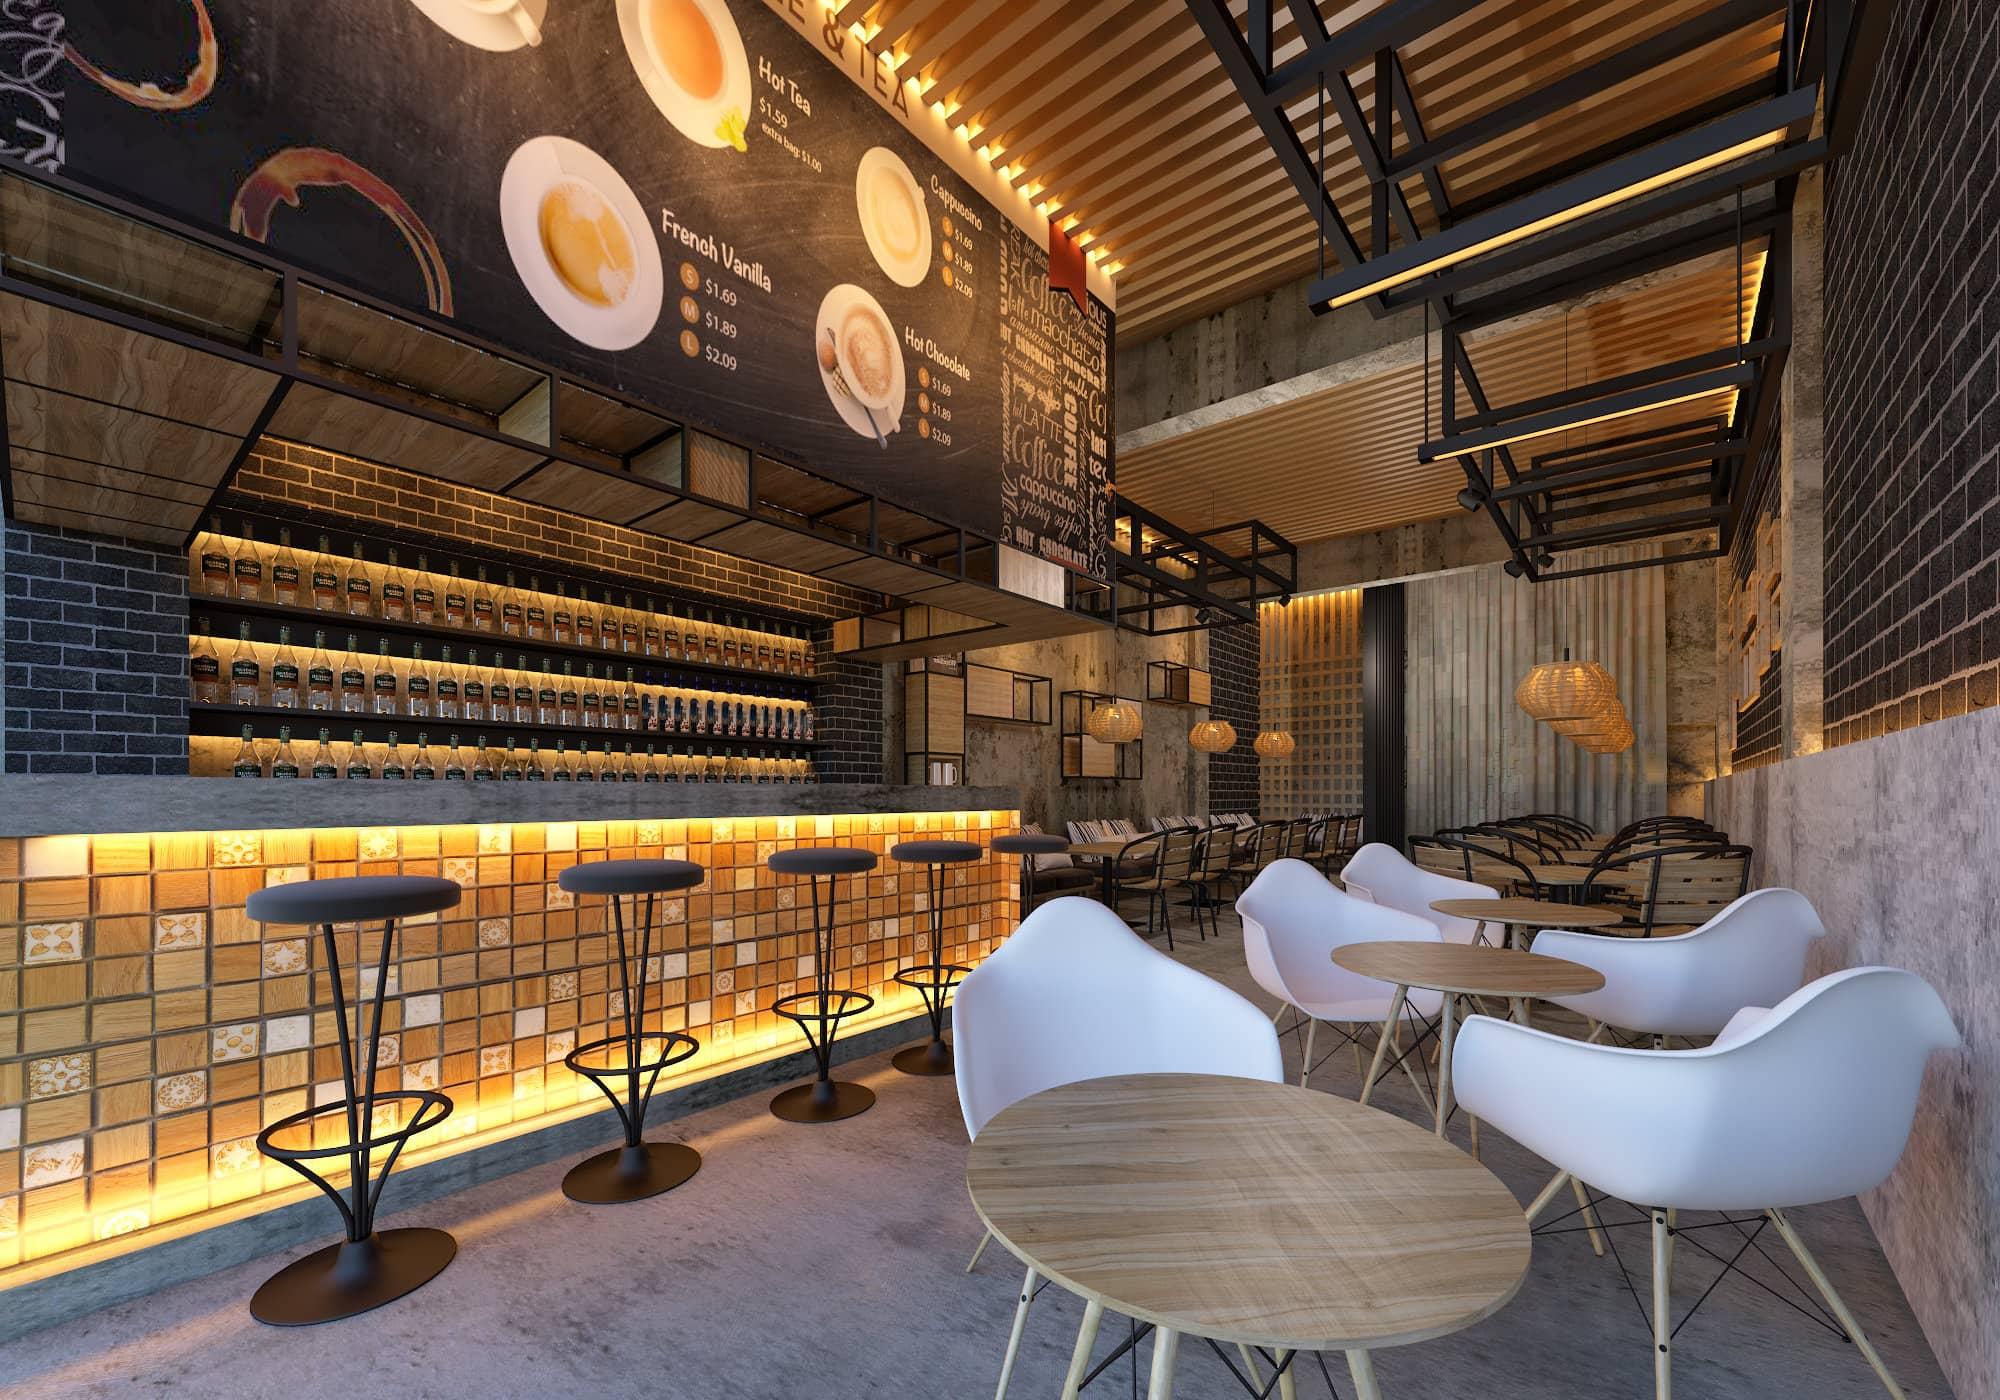 Industrial Coffee Shop Gdsa Architects